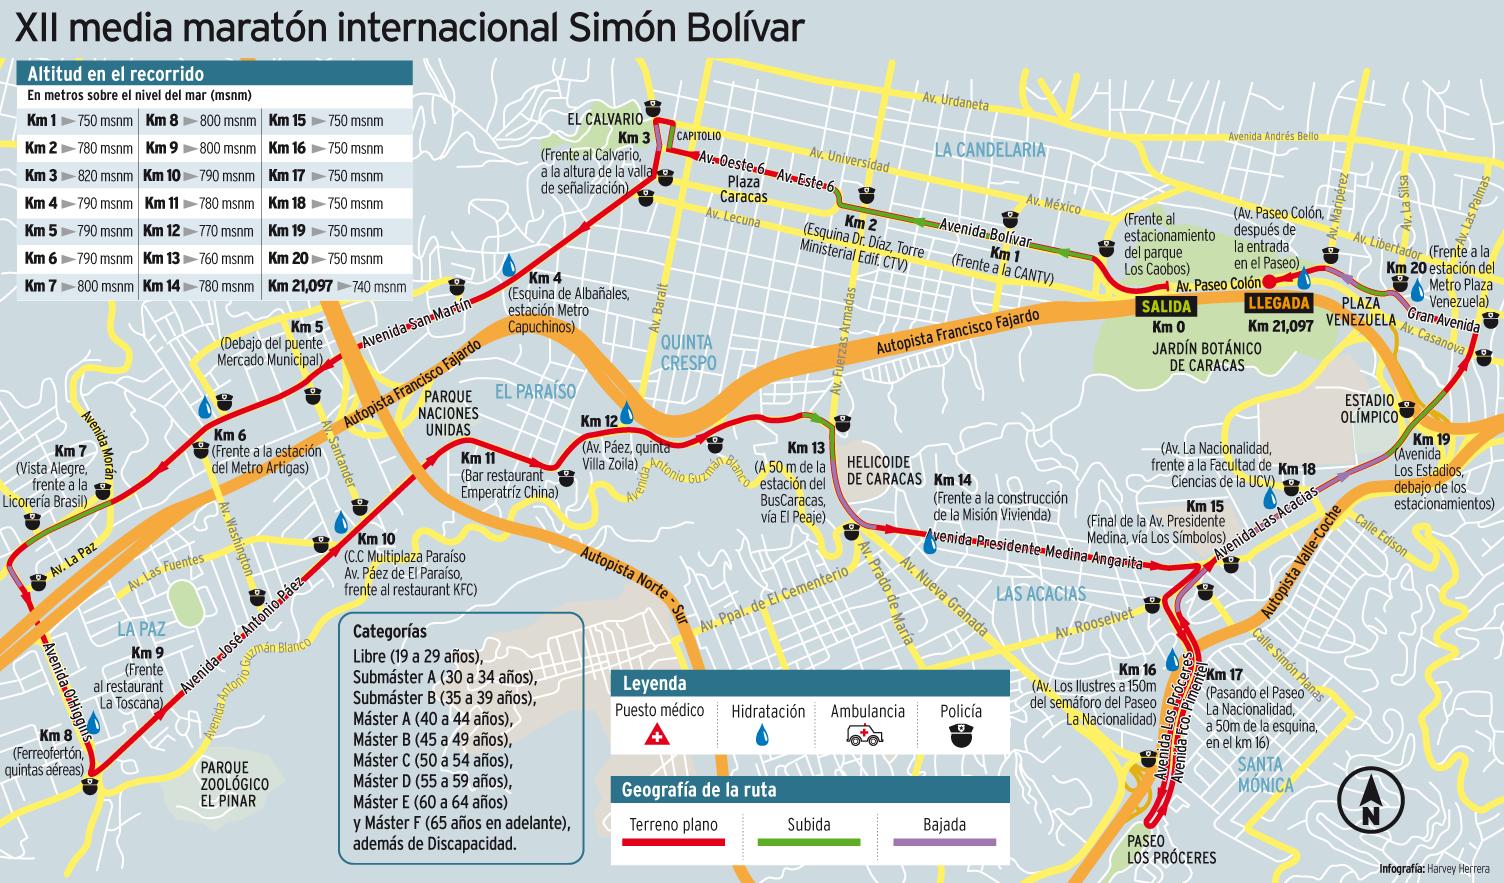 media maraton simon bolivar 2013